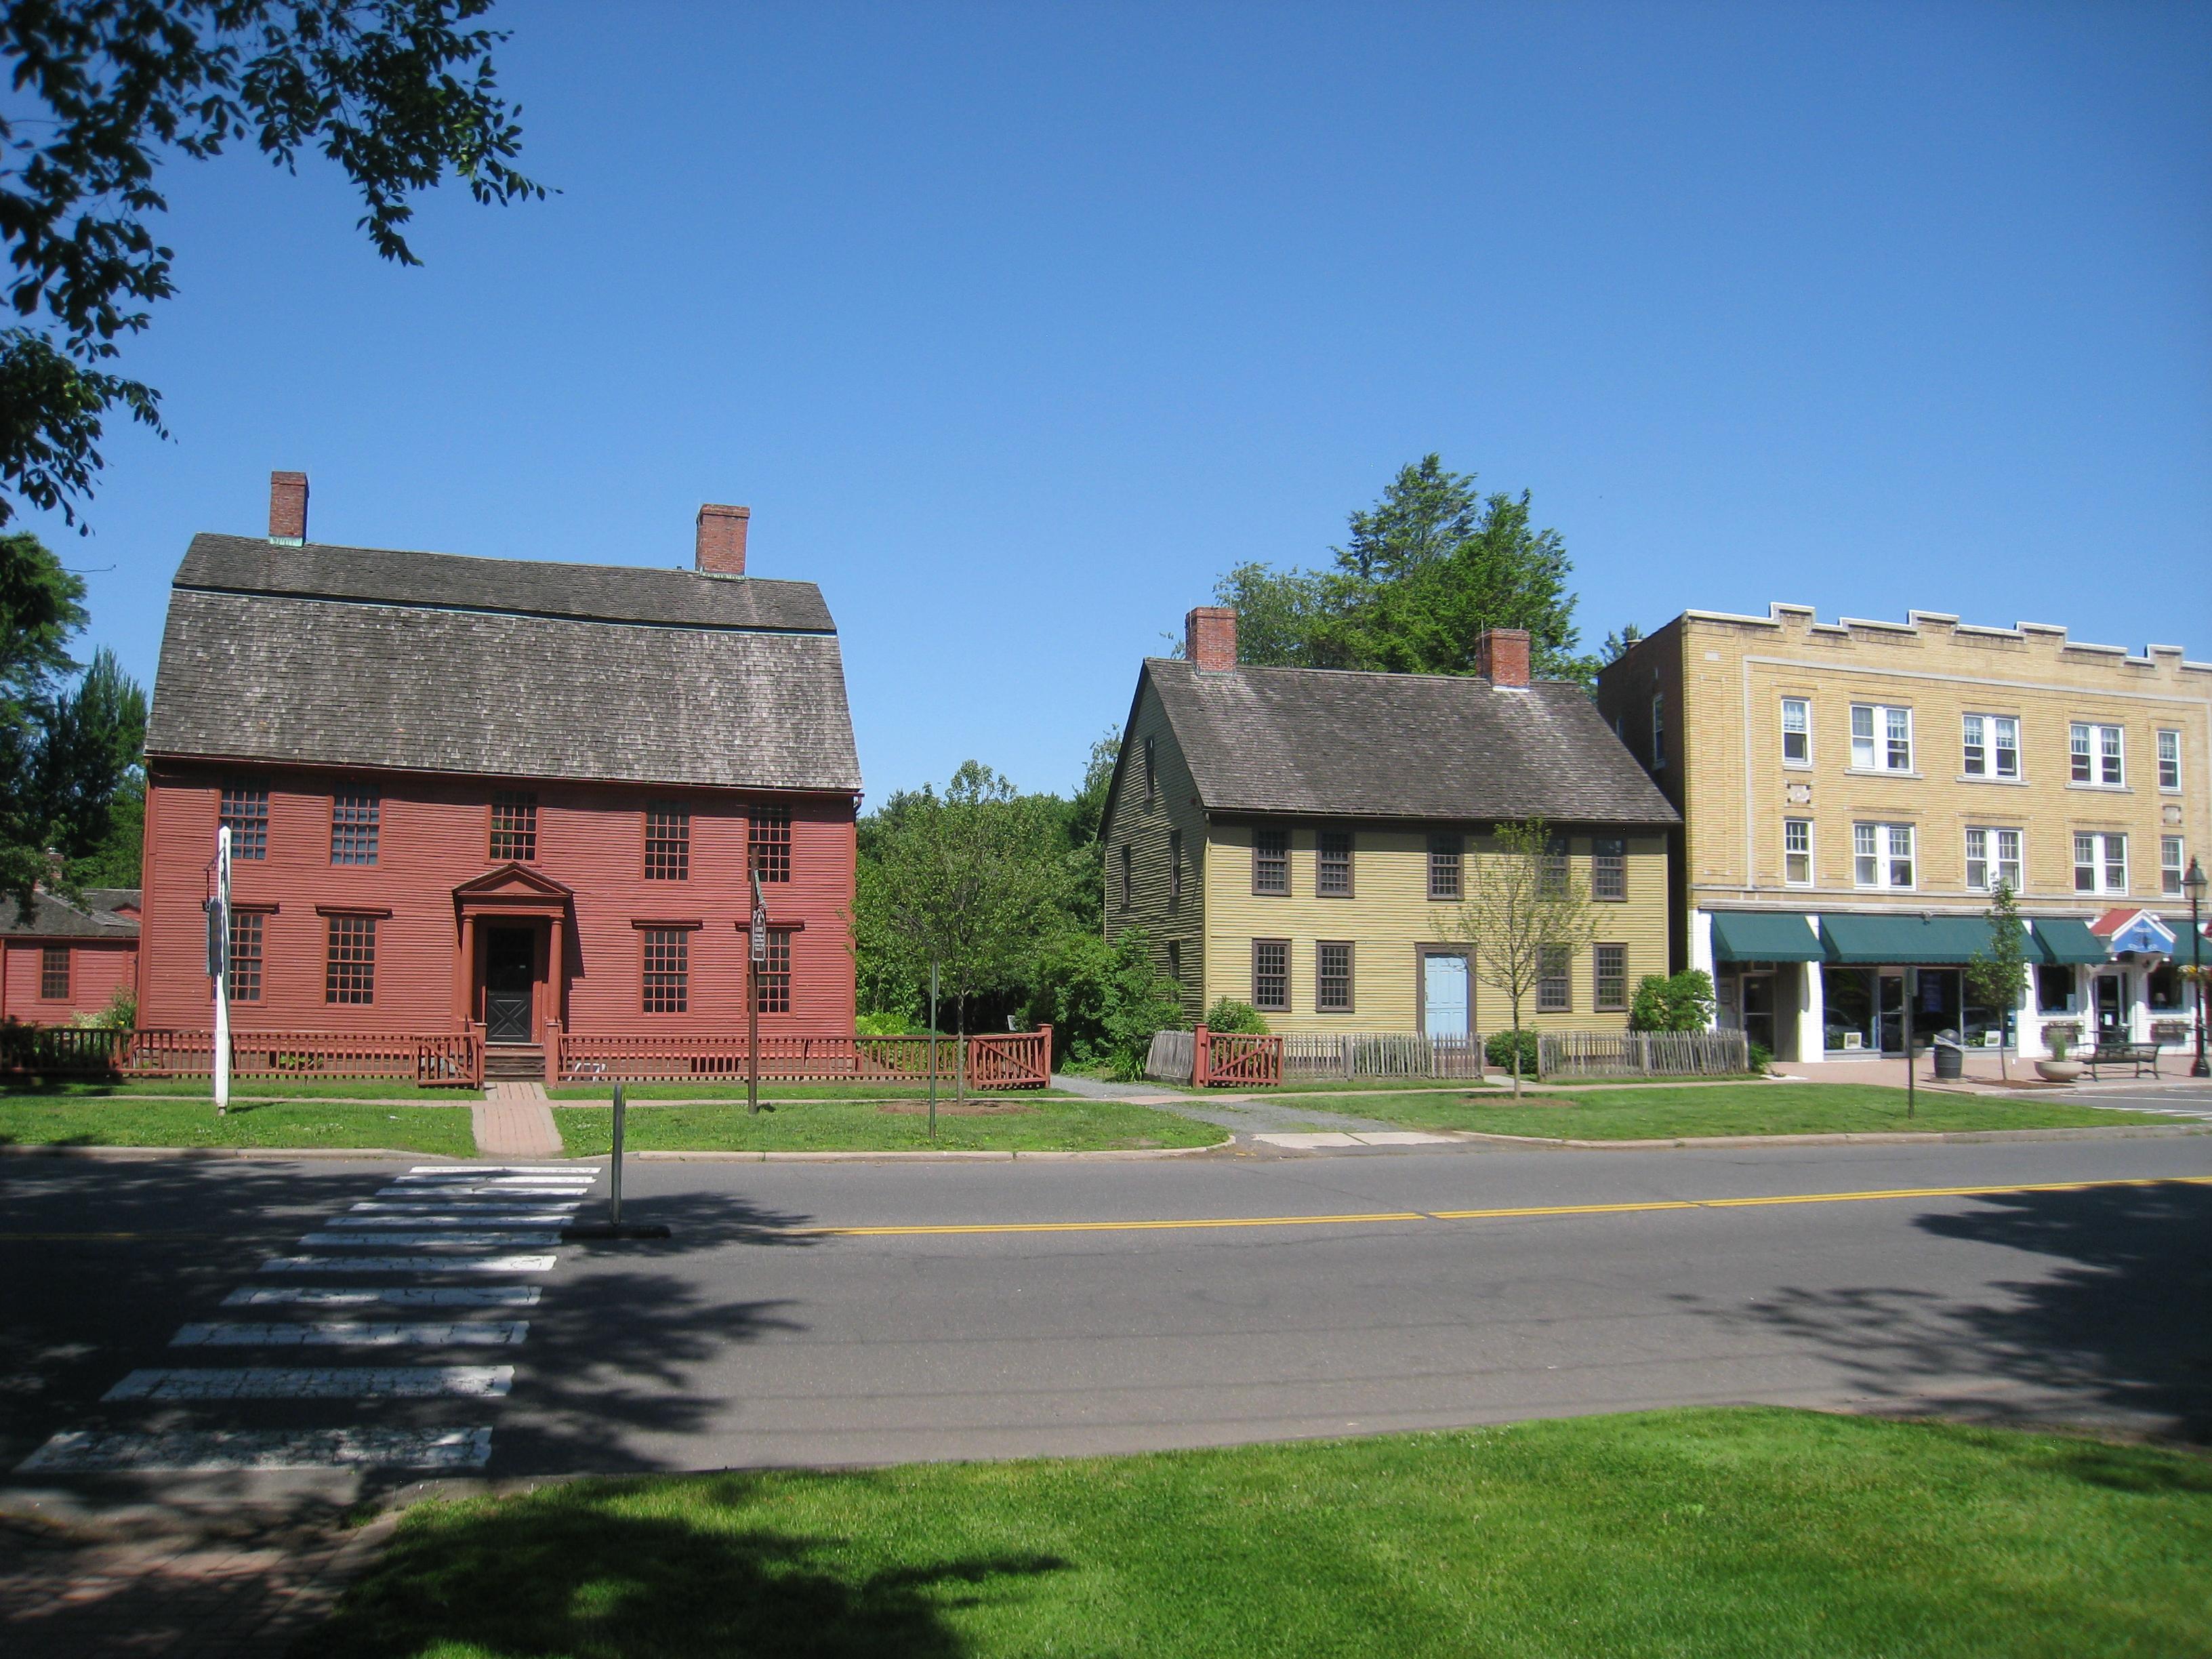 Joseph Webb and Isaac Stevens Houses - Wethersfield, CT - 2.jpg